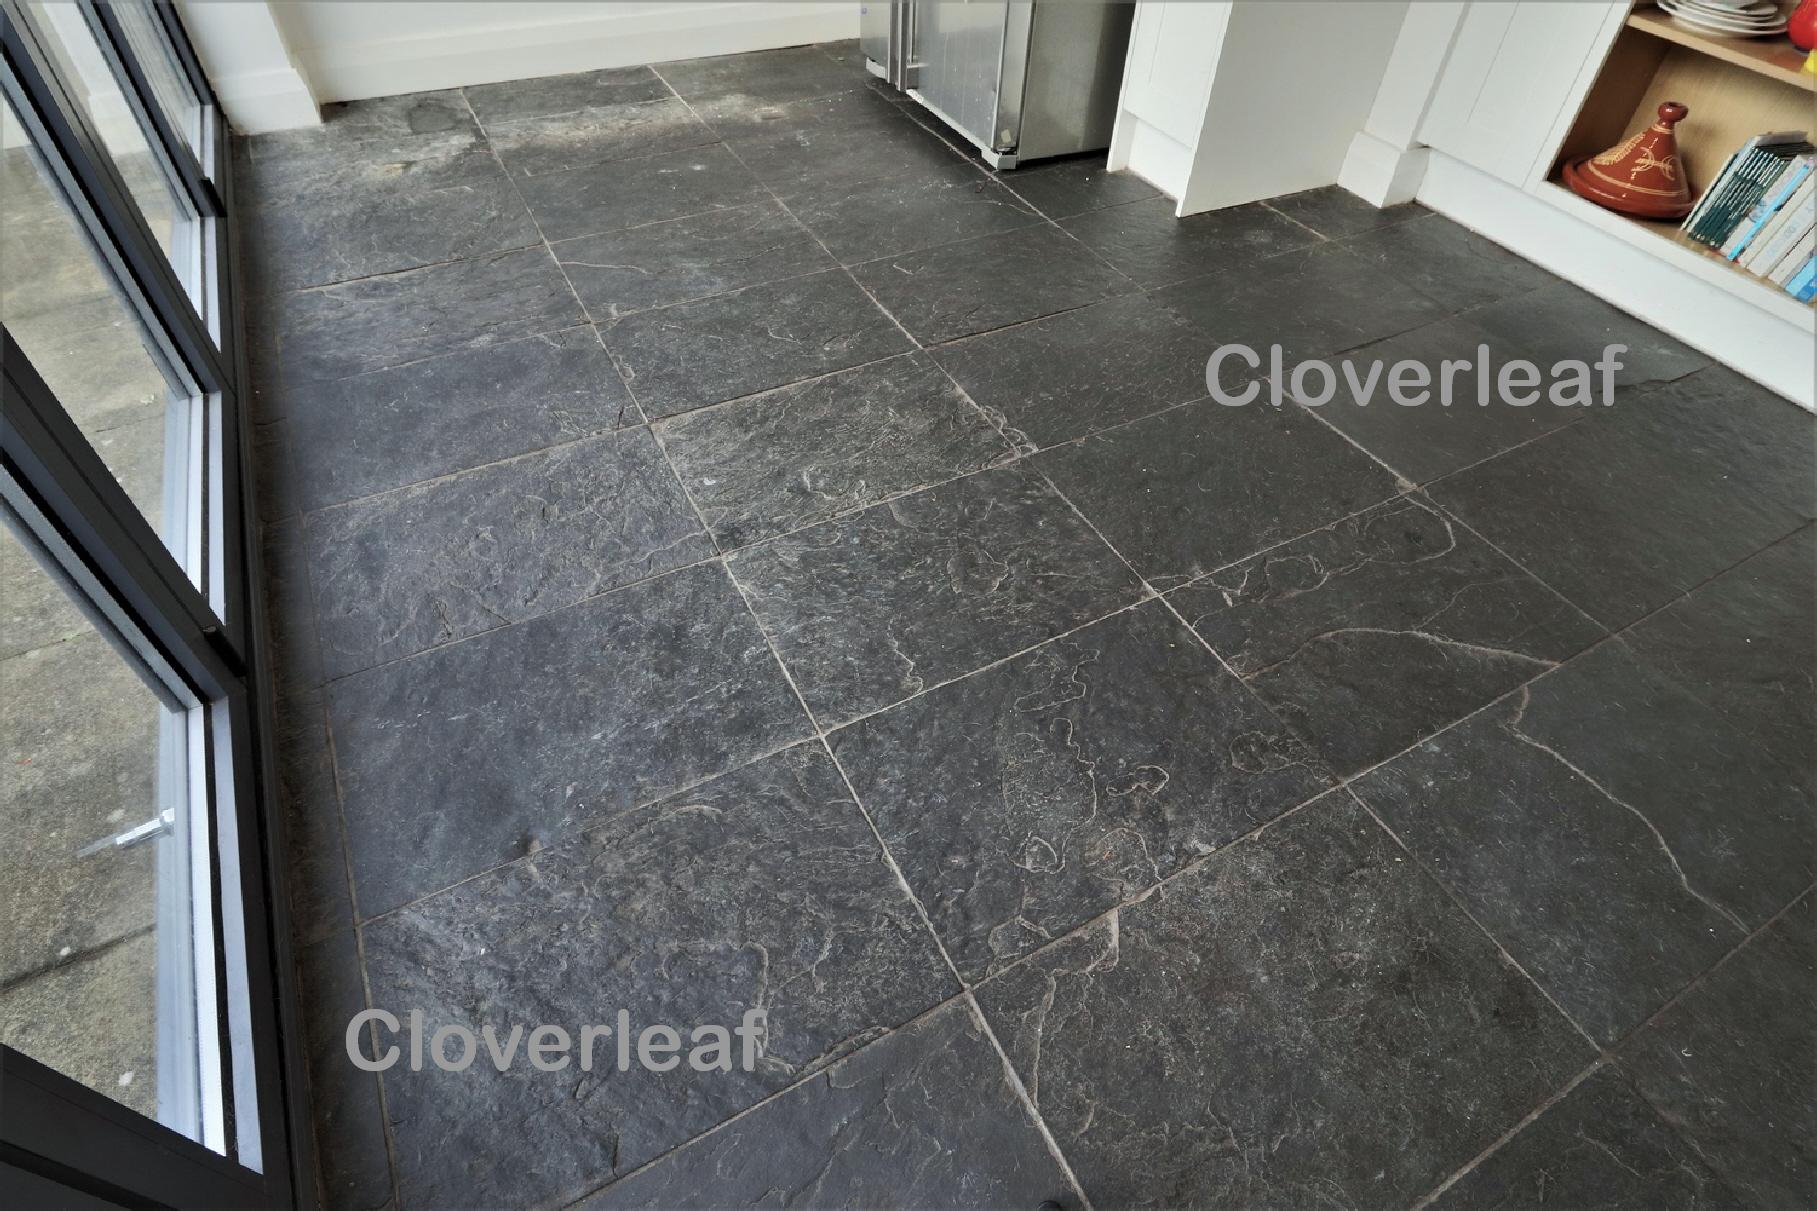 Slkate floor cleaning Crewe Cheshire